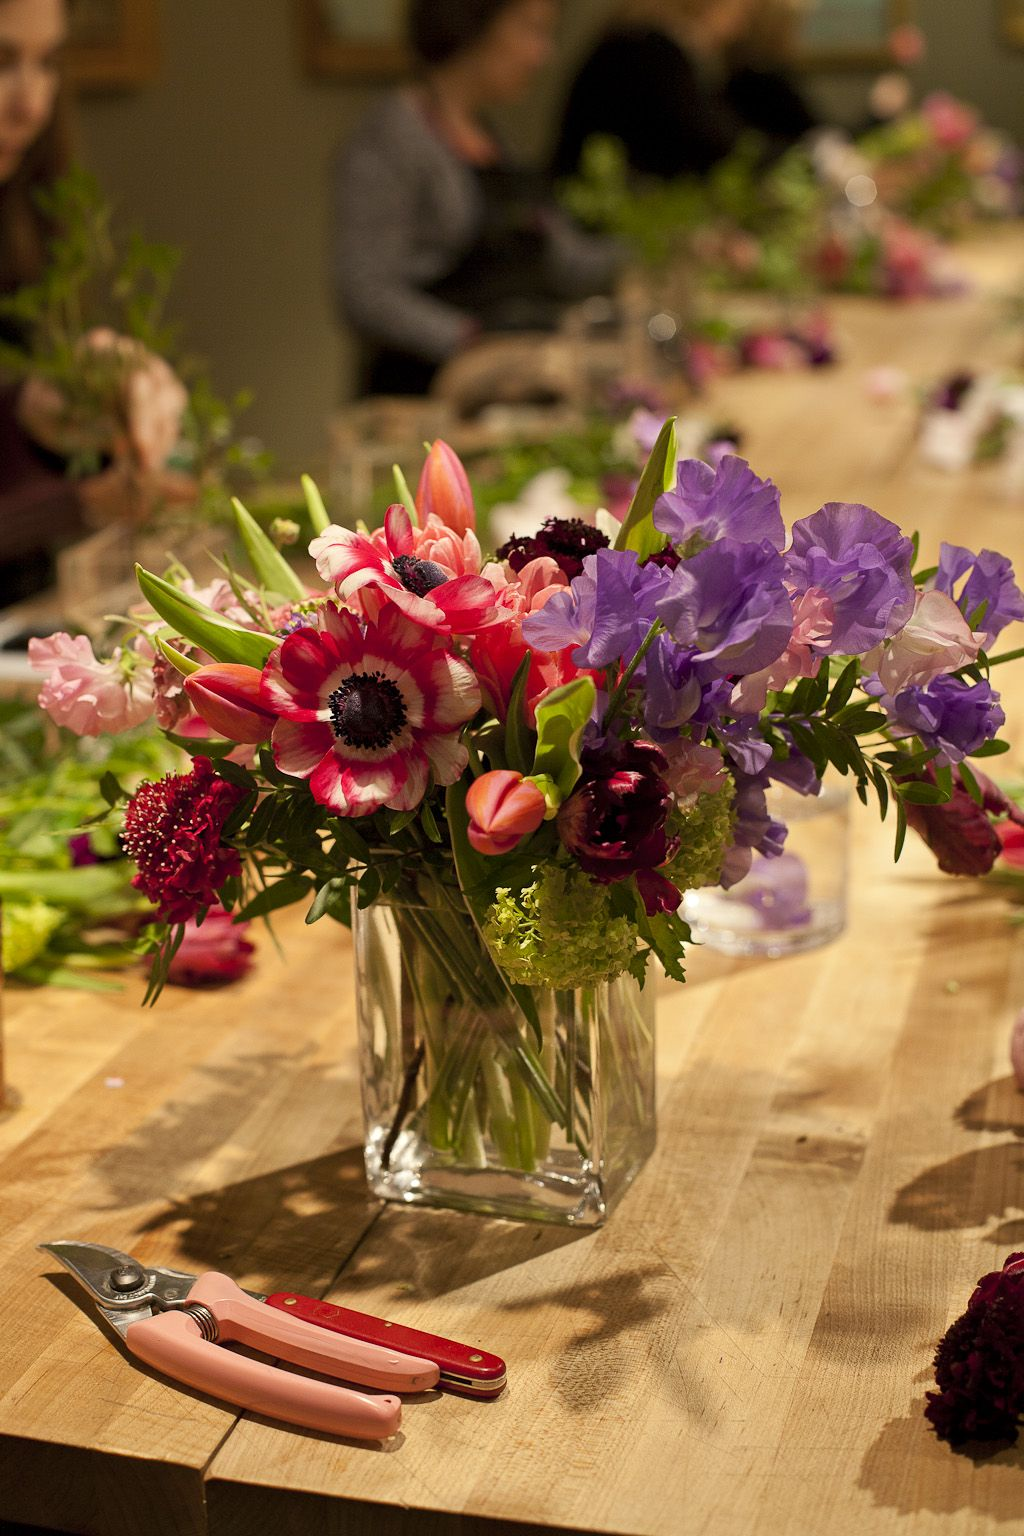 Flowerschool New York Floral Arts Flower Design Classes In Nyc